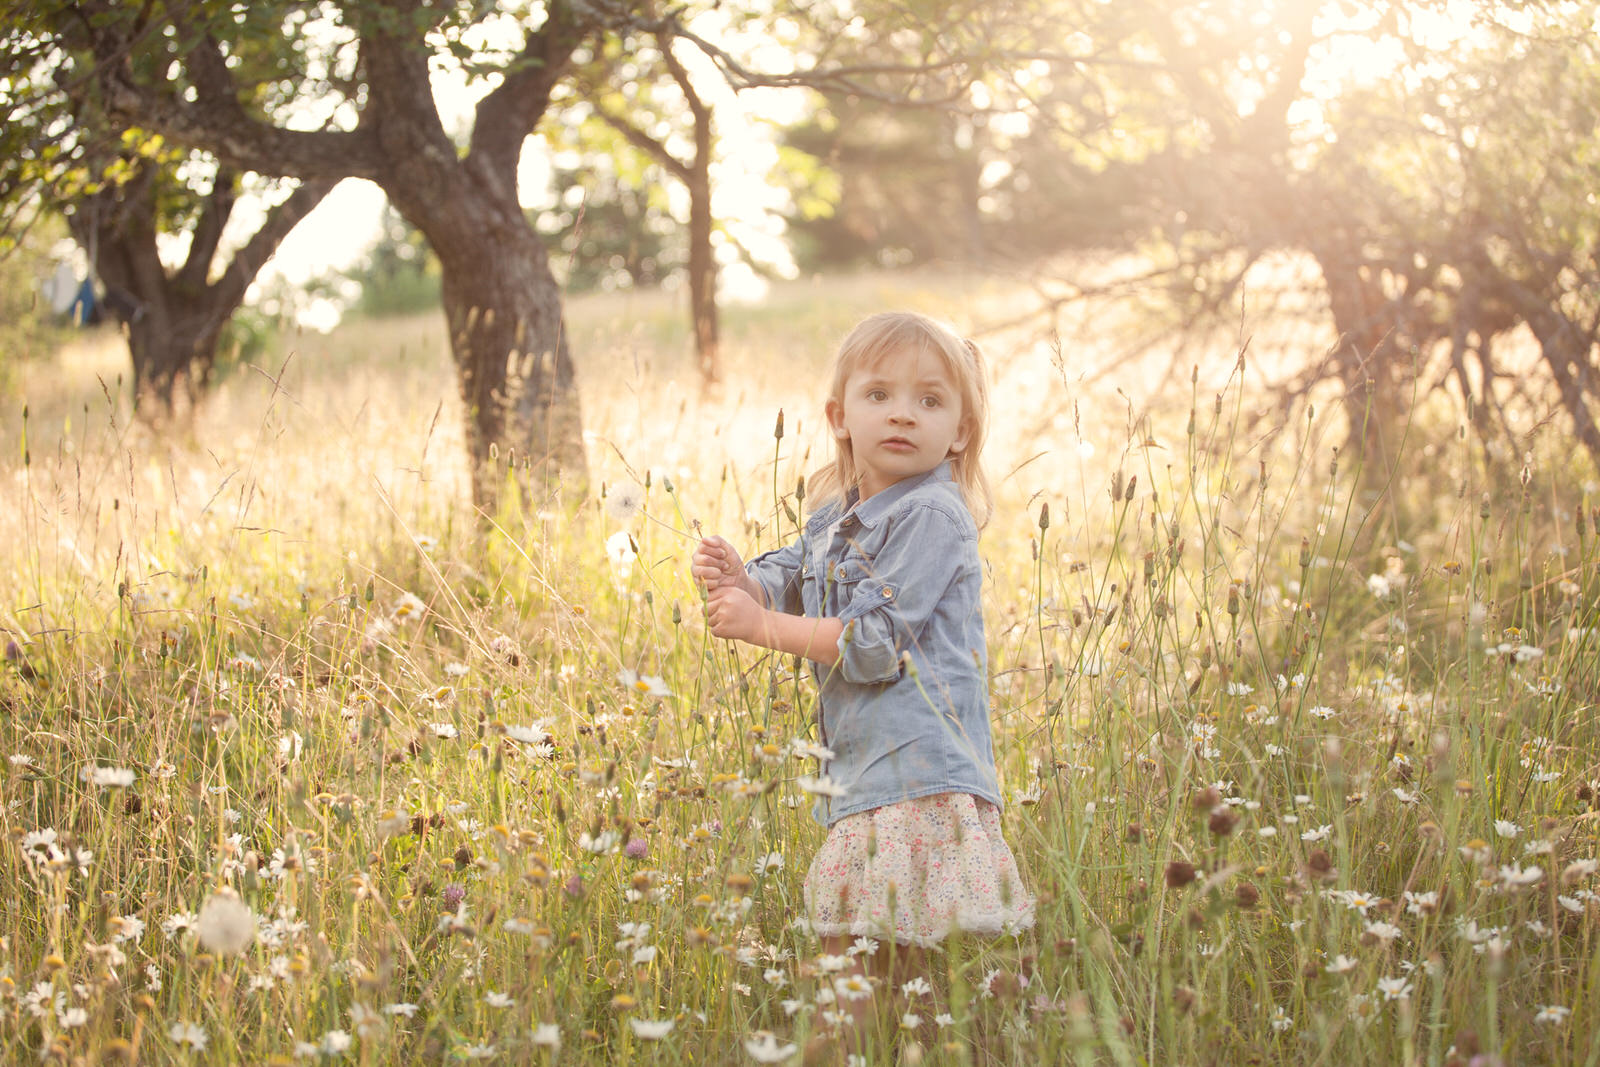 upper-peninsula-photographer-family-children-marquette-michigan-jackie-solomon-007.jpg